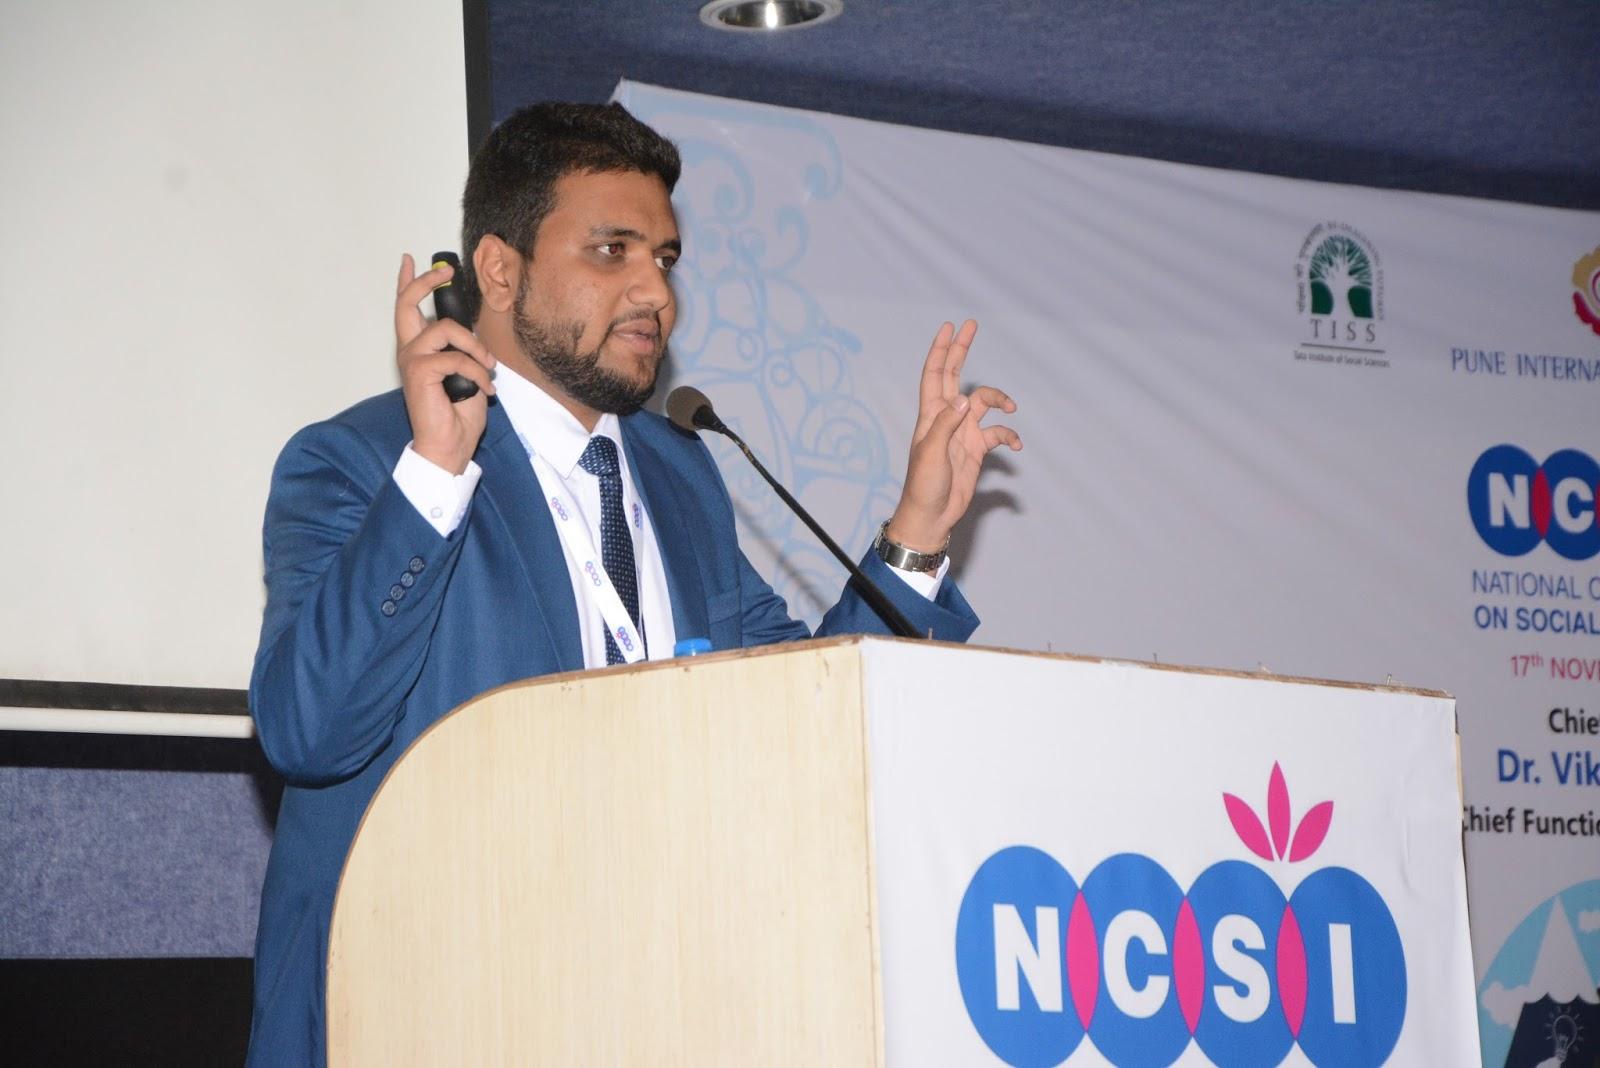 Jawwad Patel NCSI PIC pune